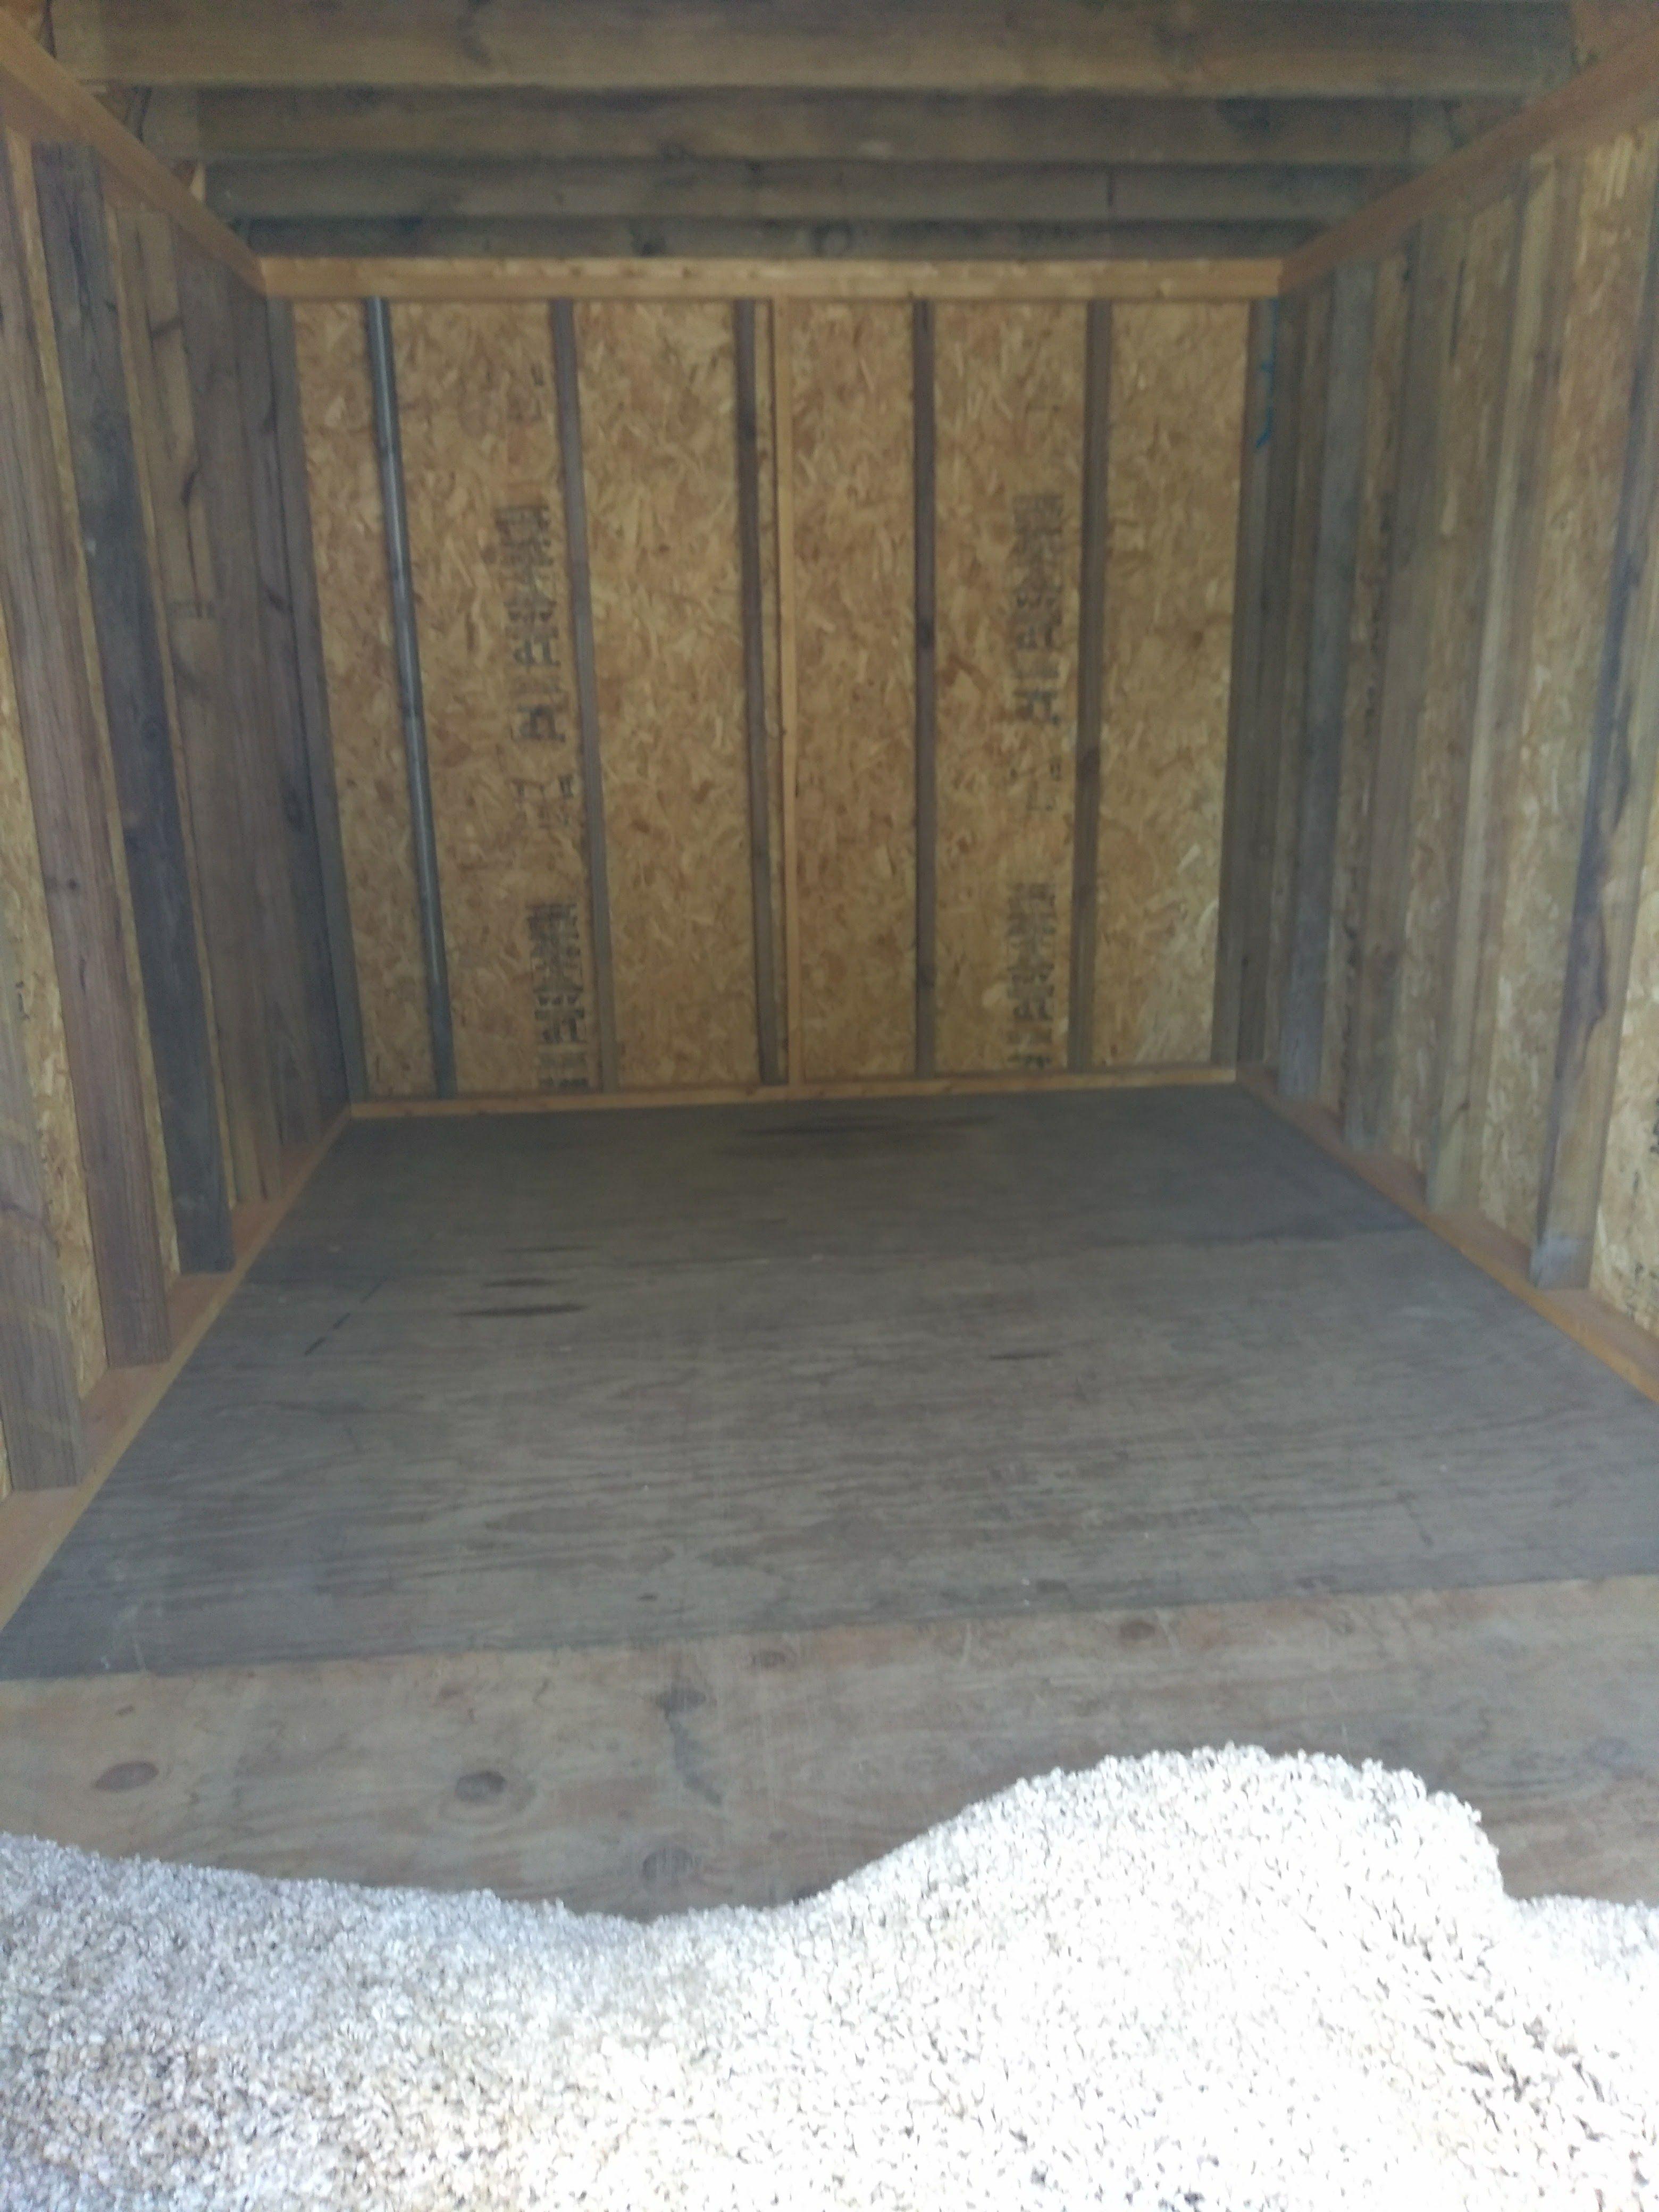 Pin By Paula Hughes Hopper On My Shed In 2020 Hardwood Floors Flooring Hardwood